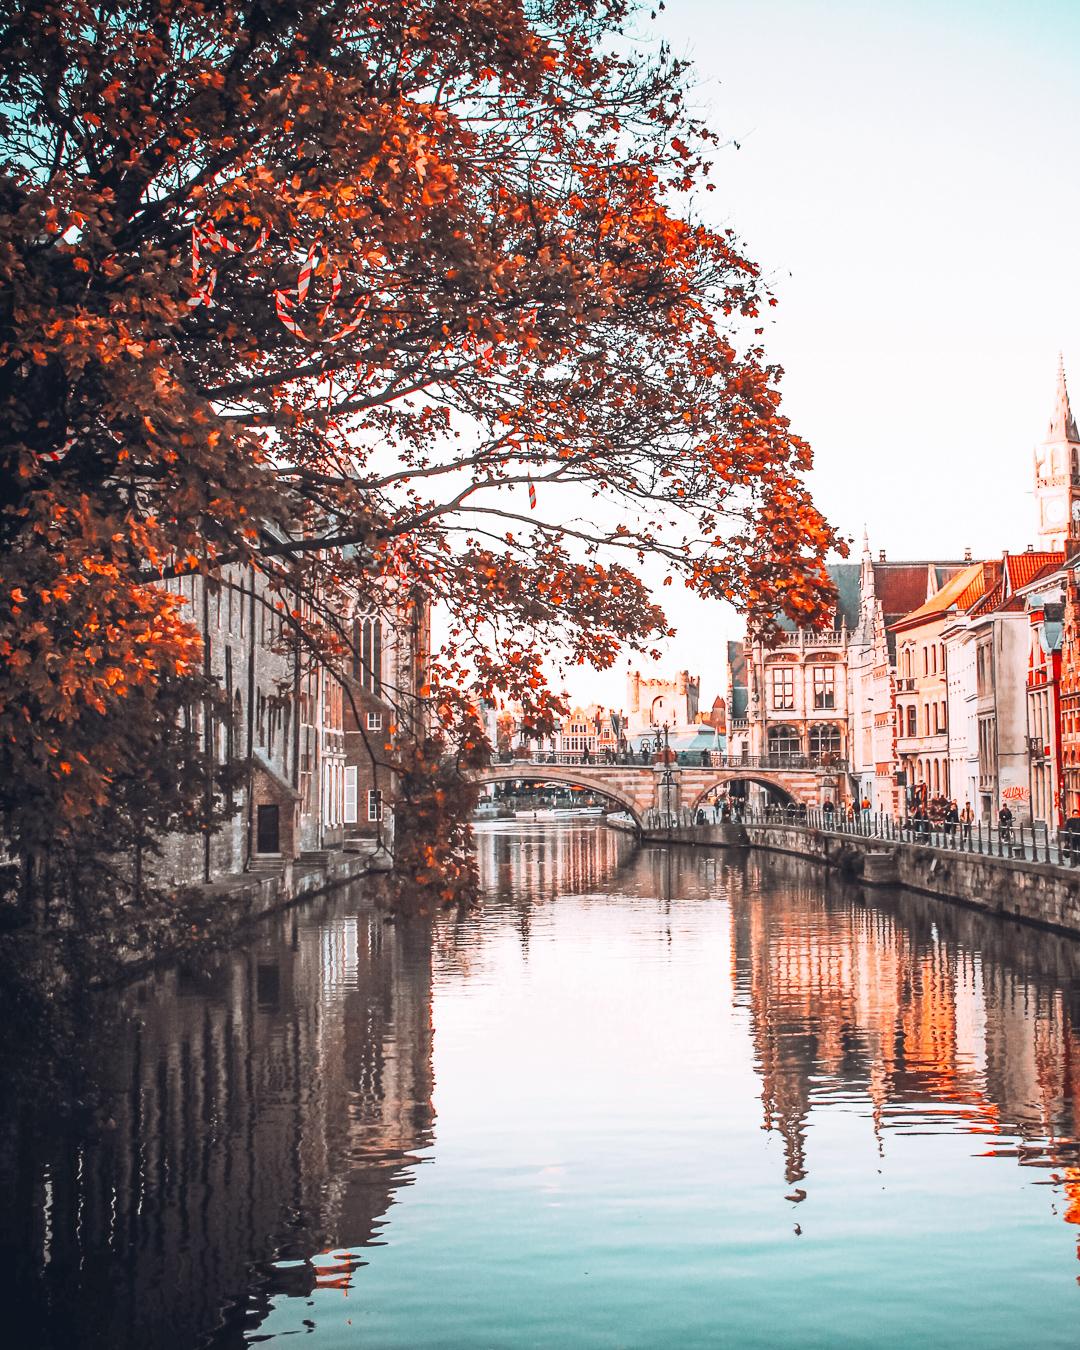 Ghent during autumn